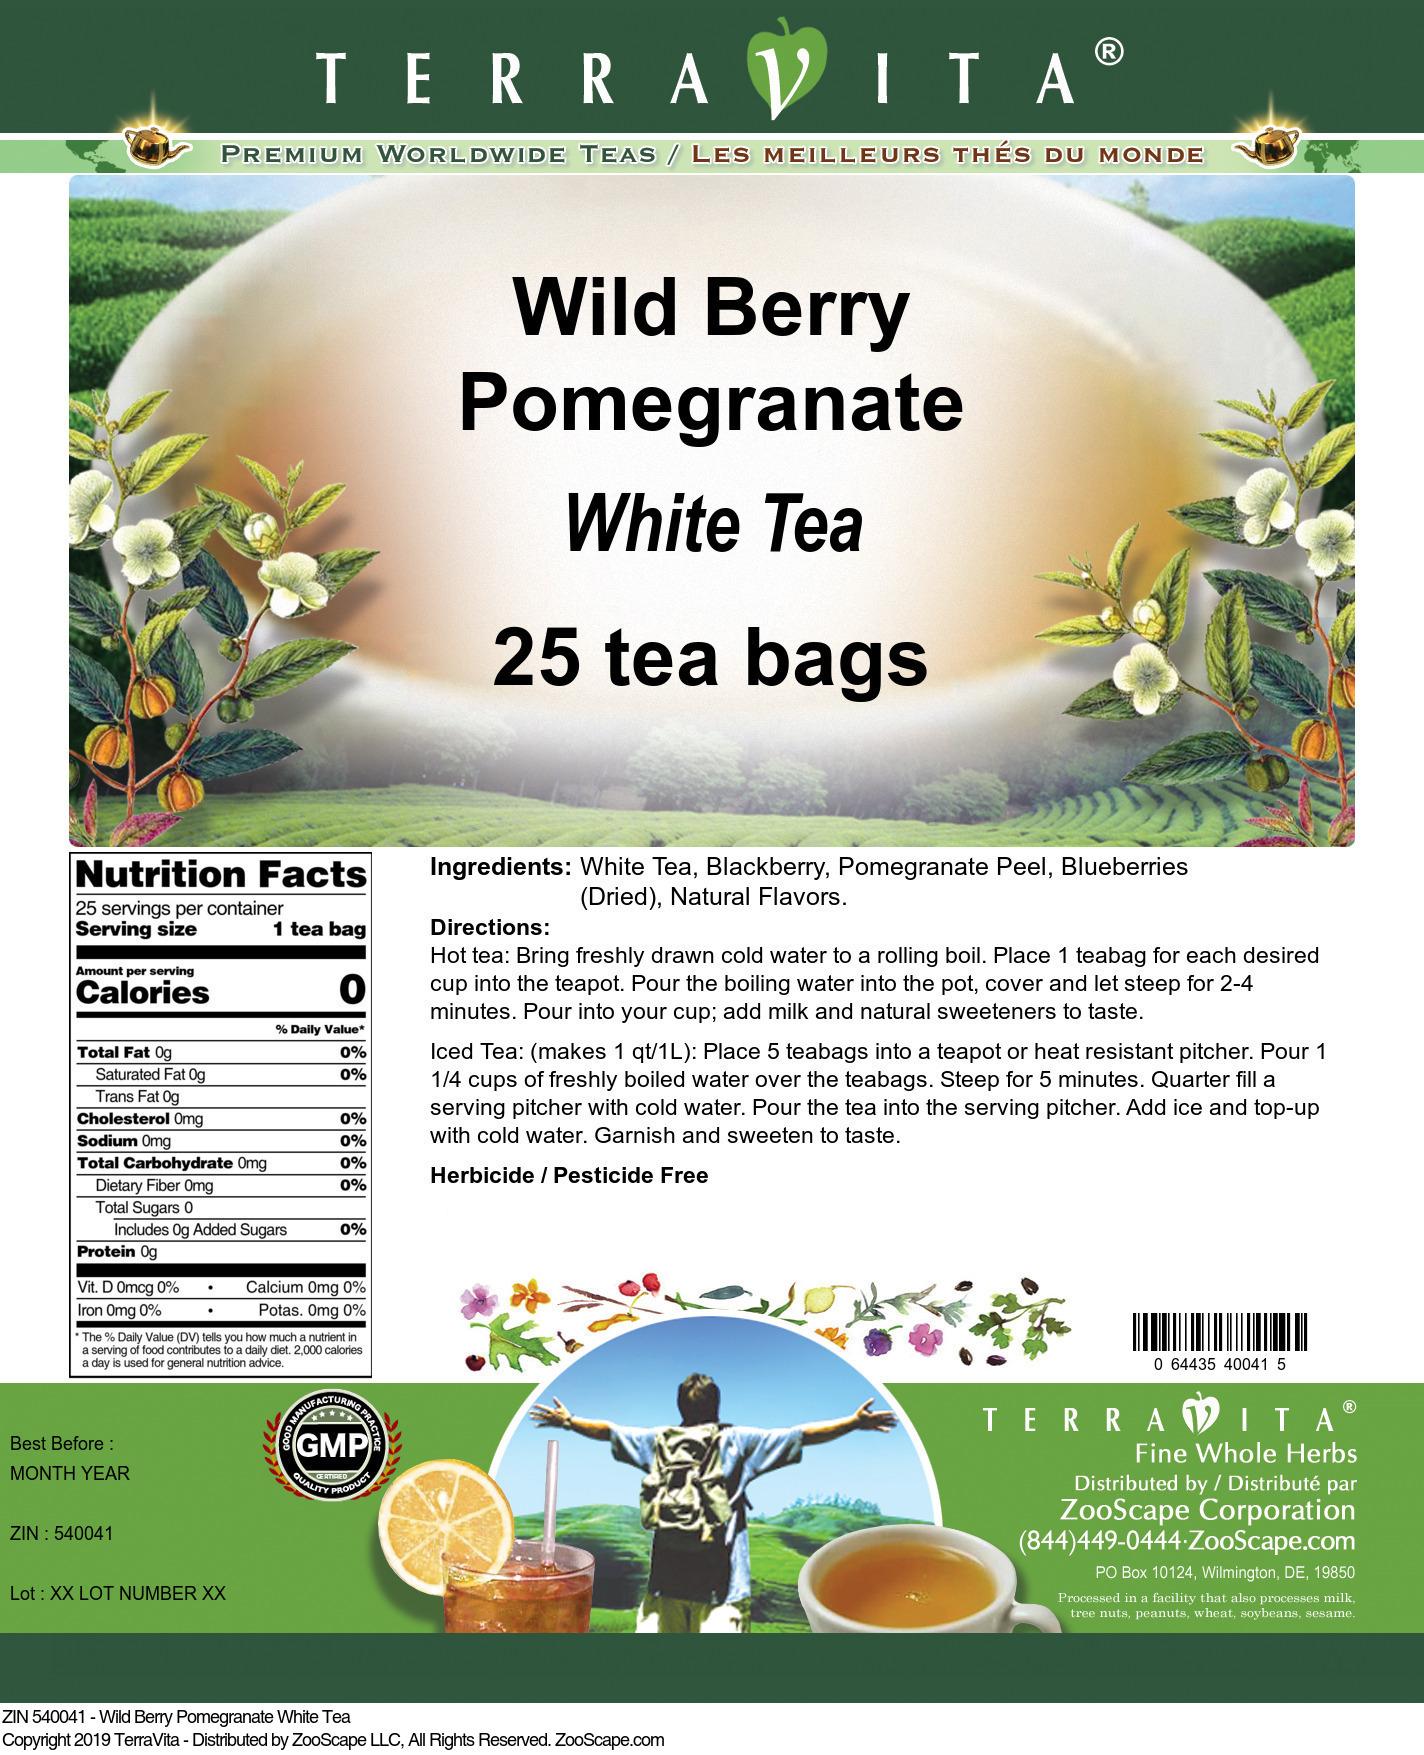 Wild Berry Pomegranate White Tea